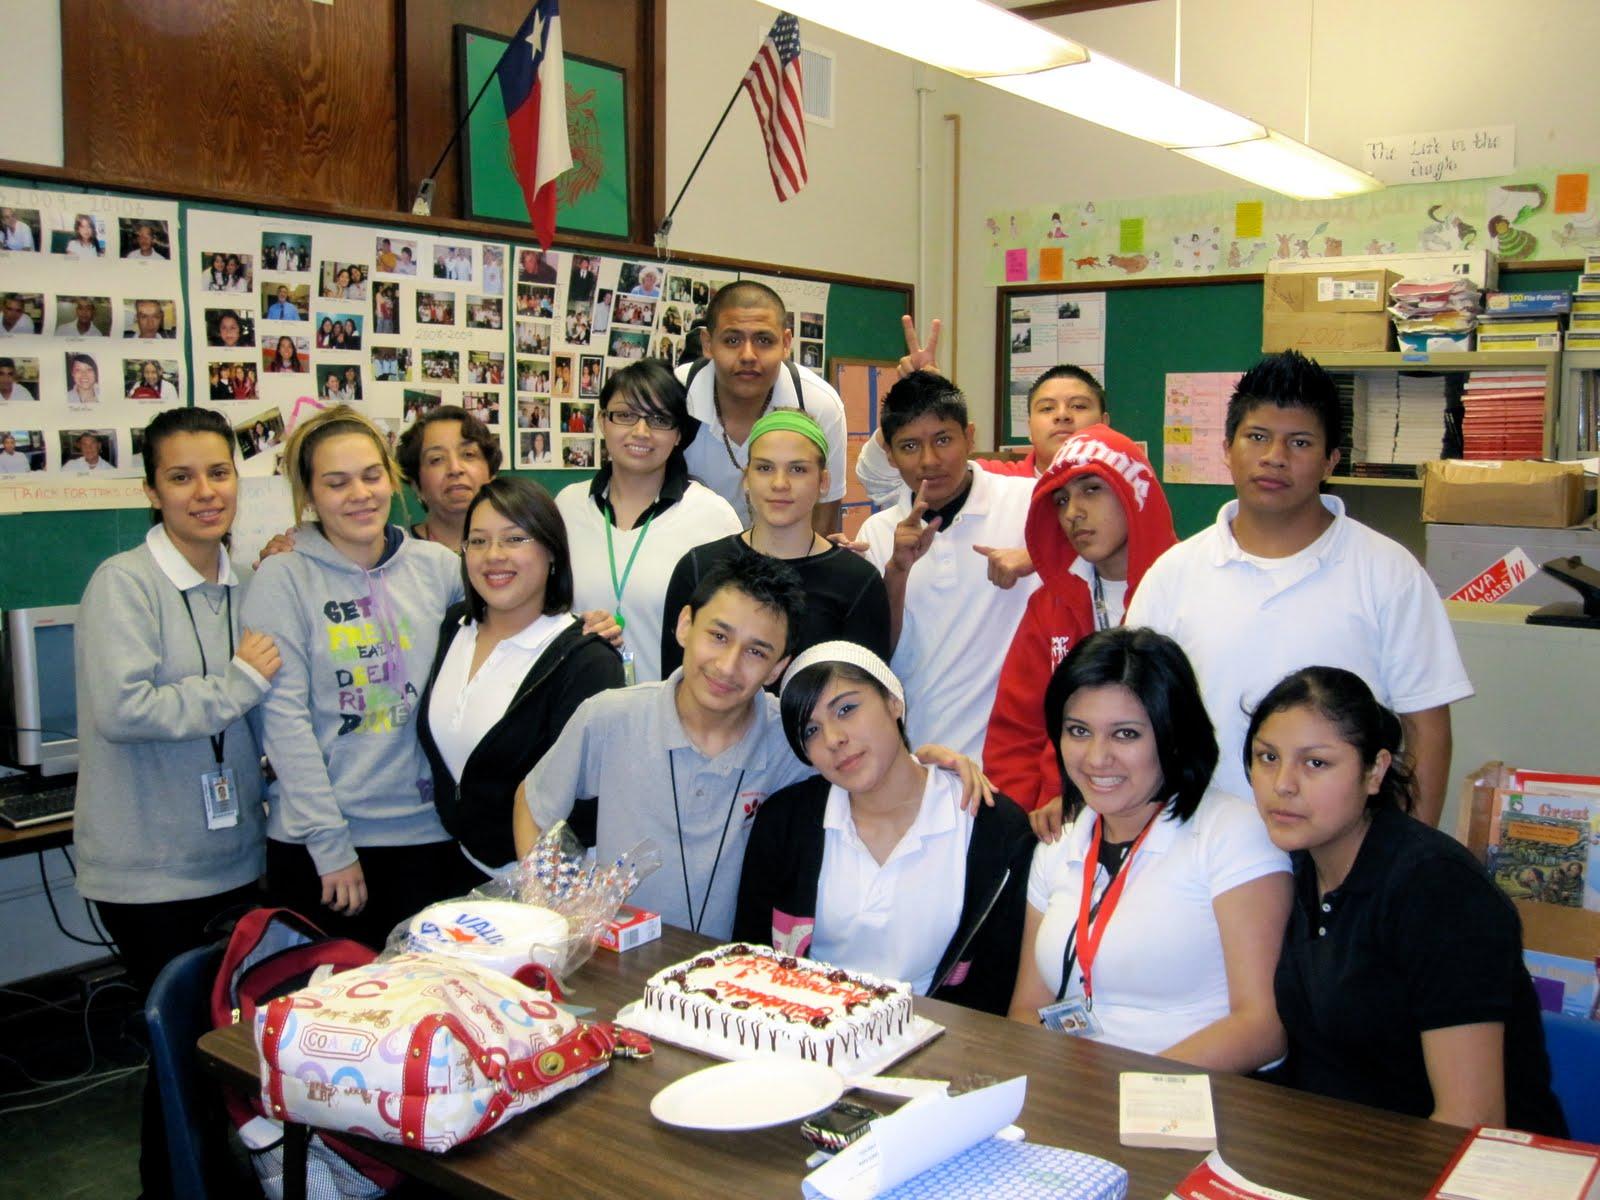 Kyle Yoakum Esl Classes At Woodrow Wilson High School Dallas Texas